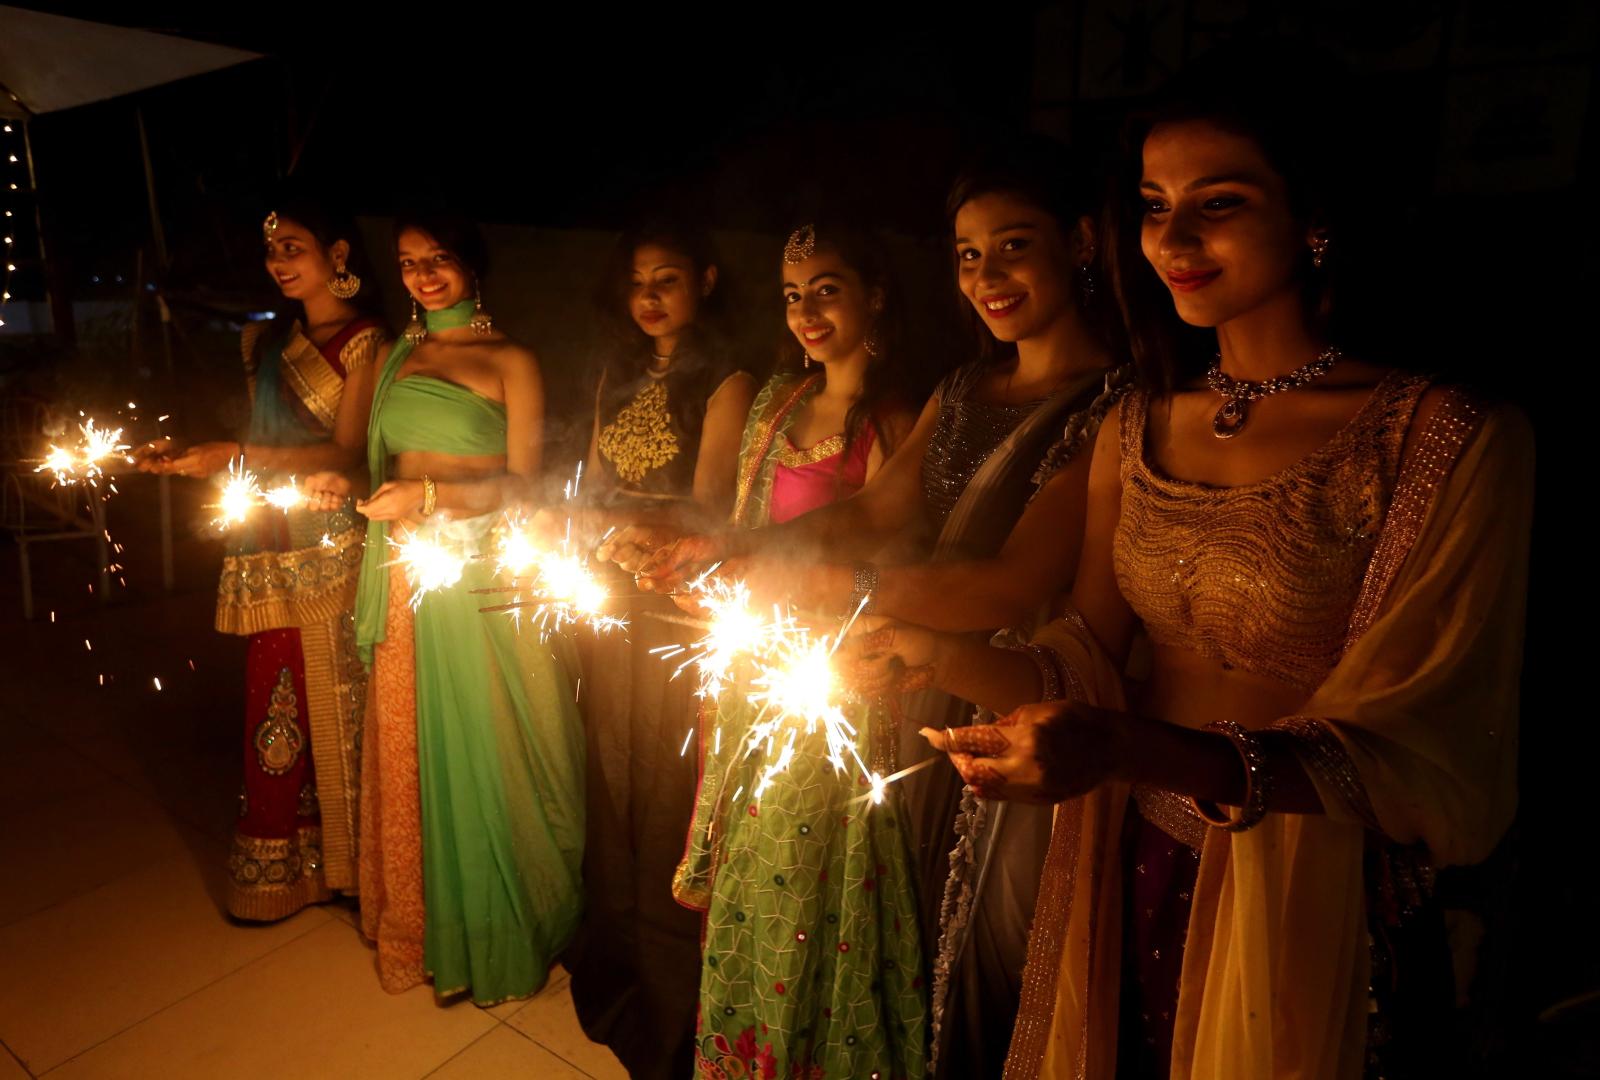 Festiwal Diwali w indyjskim Bhopal Fot. PAP/EPA/SANJEEV GUPTA